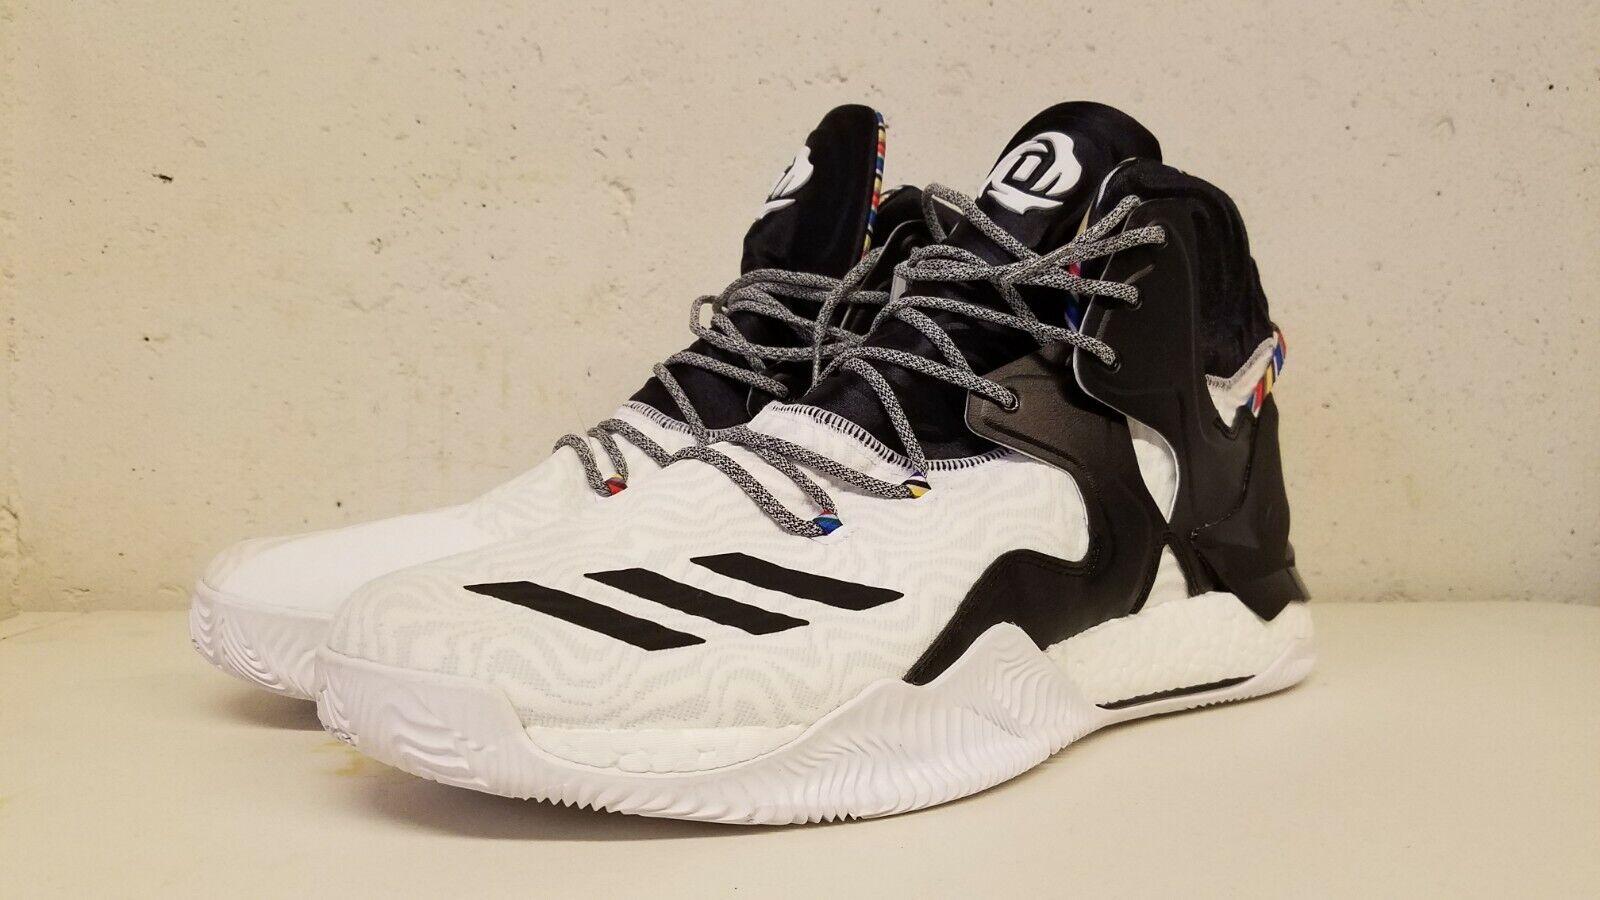 Adidas Derrick pink 7 Arthur Ashe Deadstock Size 17 BY3475 Basketball Hightop